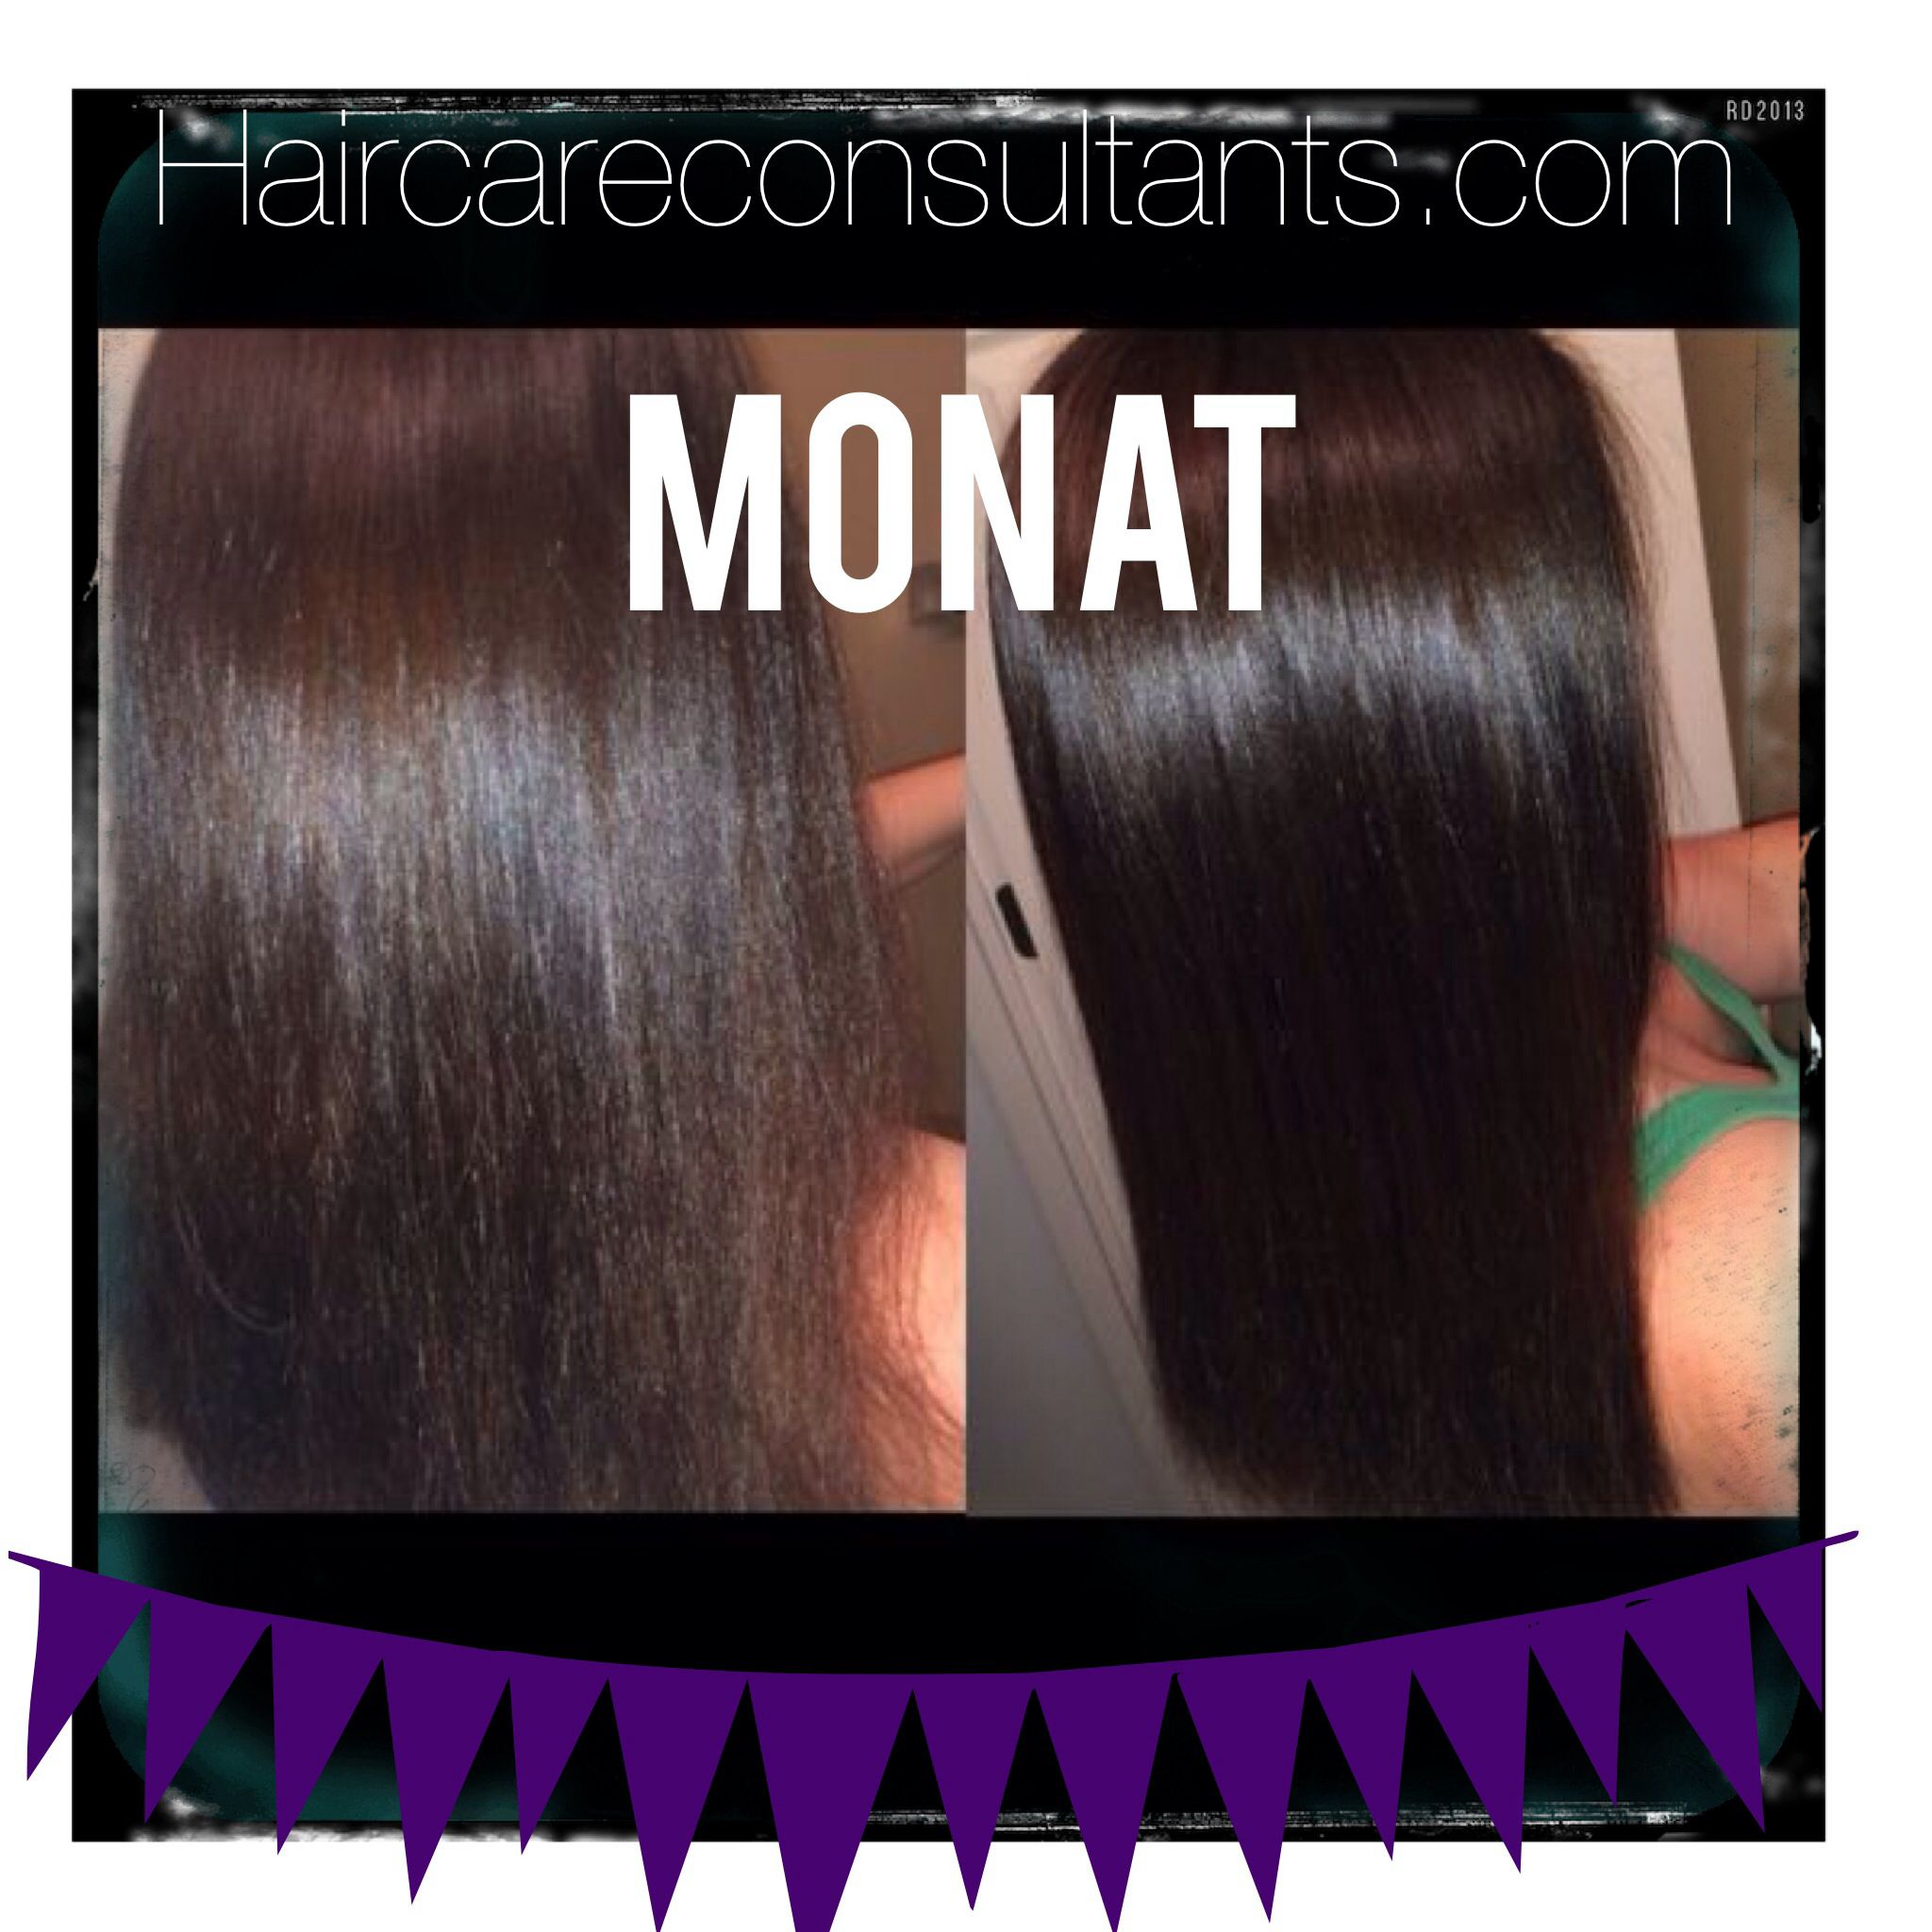 MONAT hair care products Monat hair, Monat, Beauty